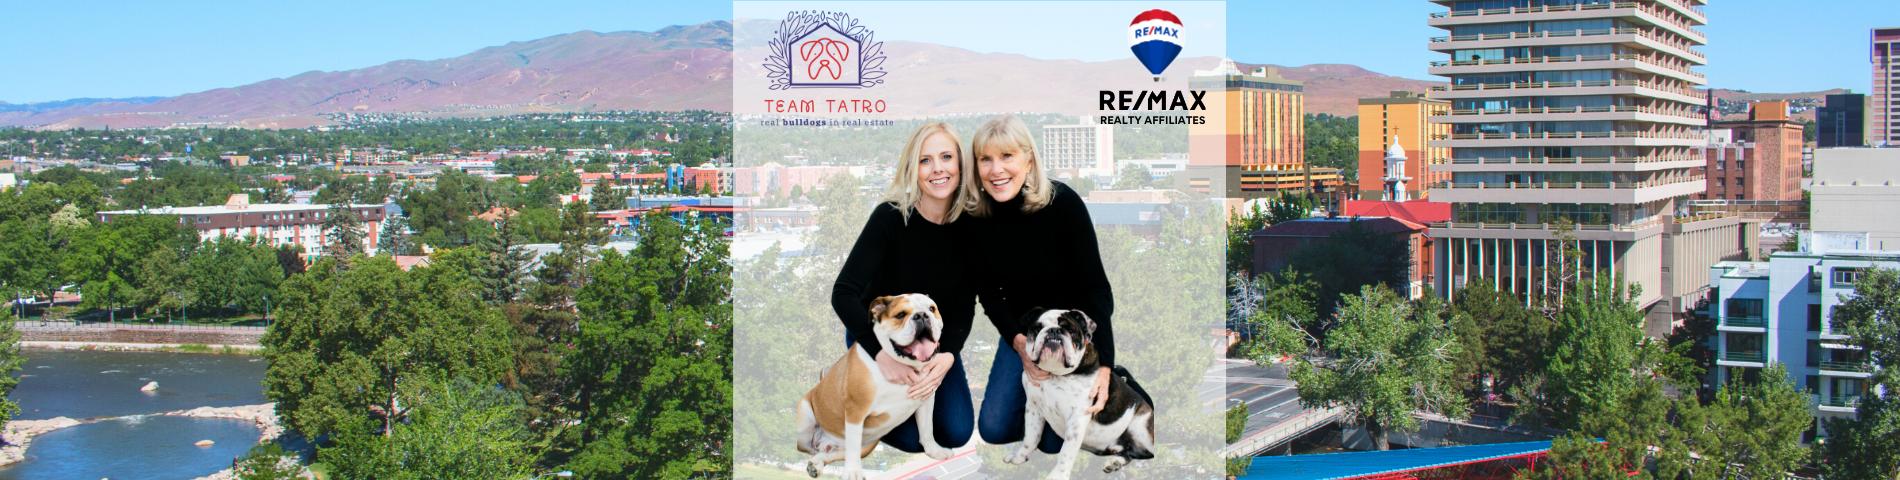 Team Tatro - REMAX